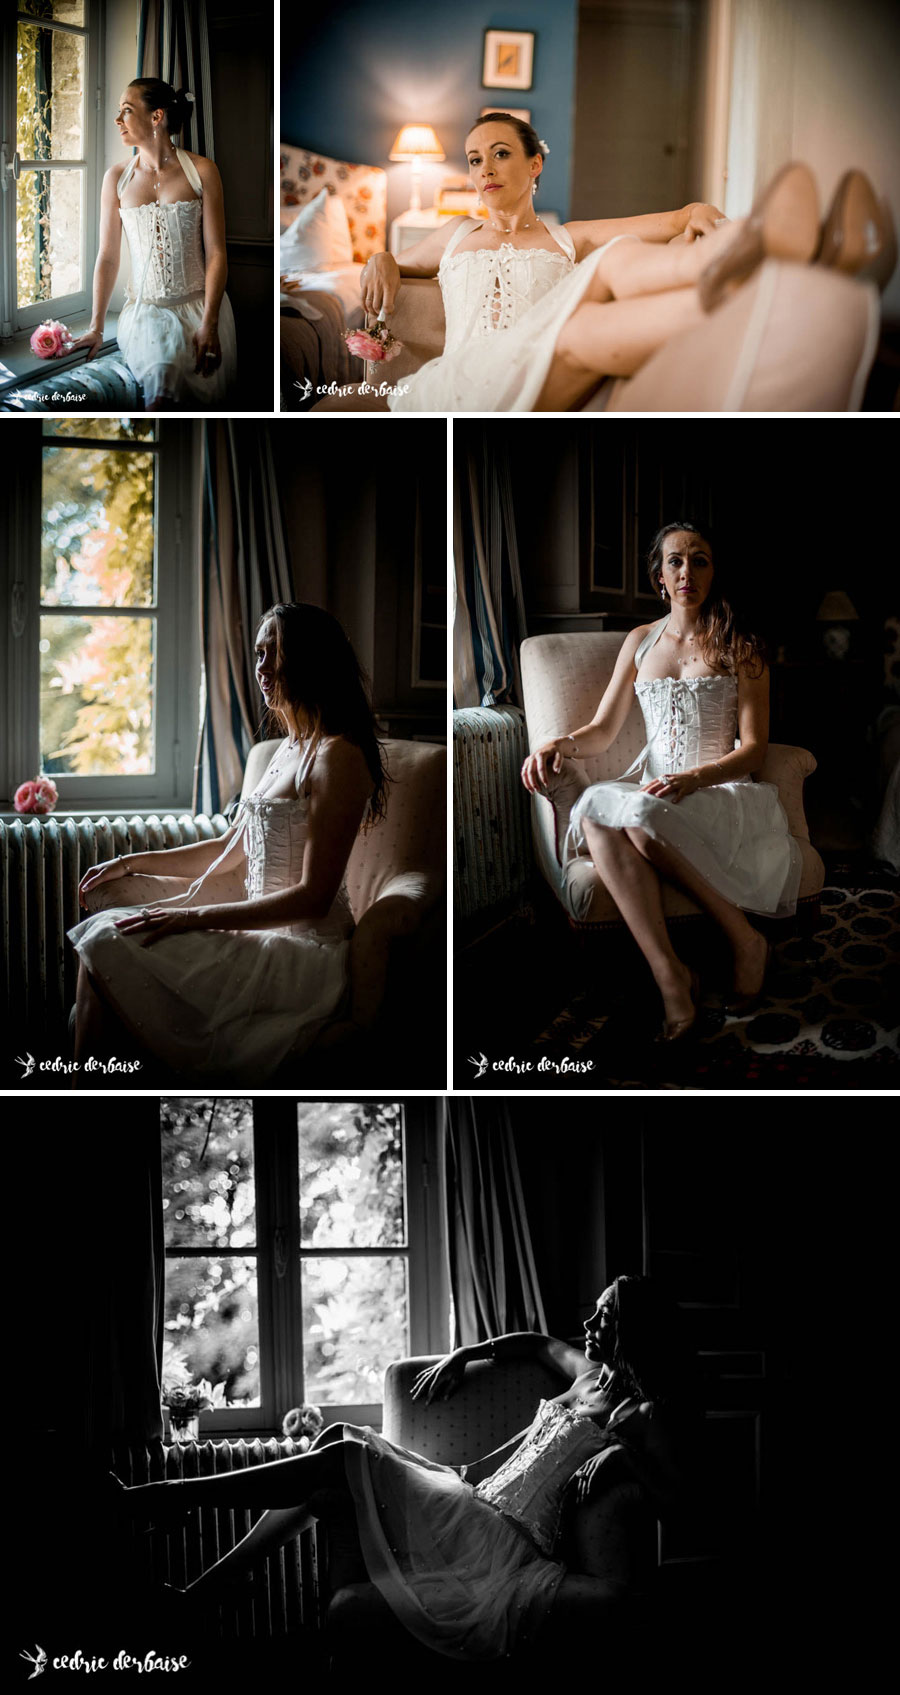 Cédric Derbaise - séance boudoir intimiste